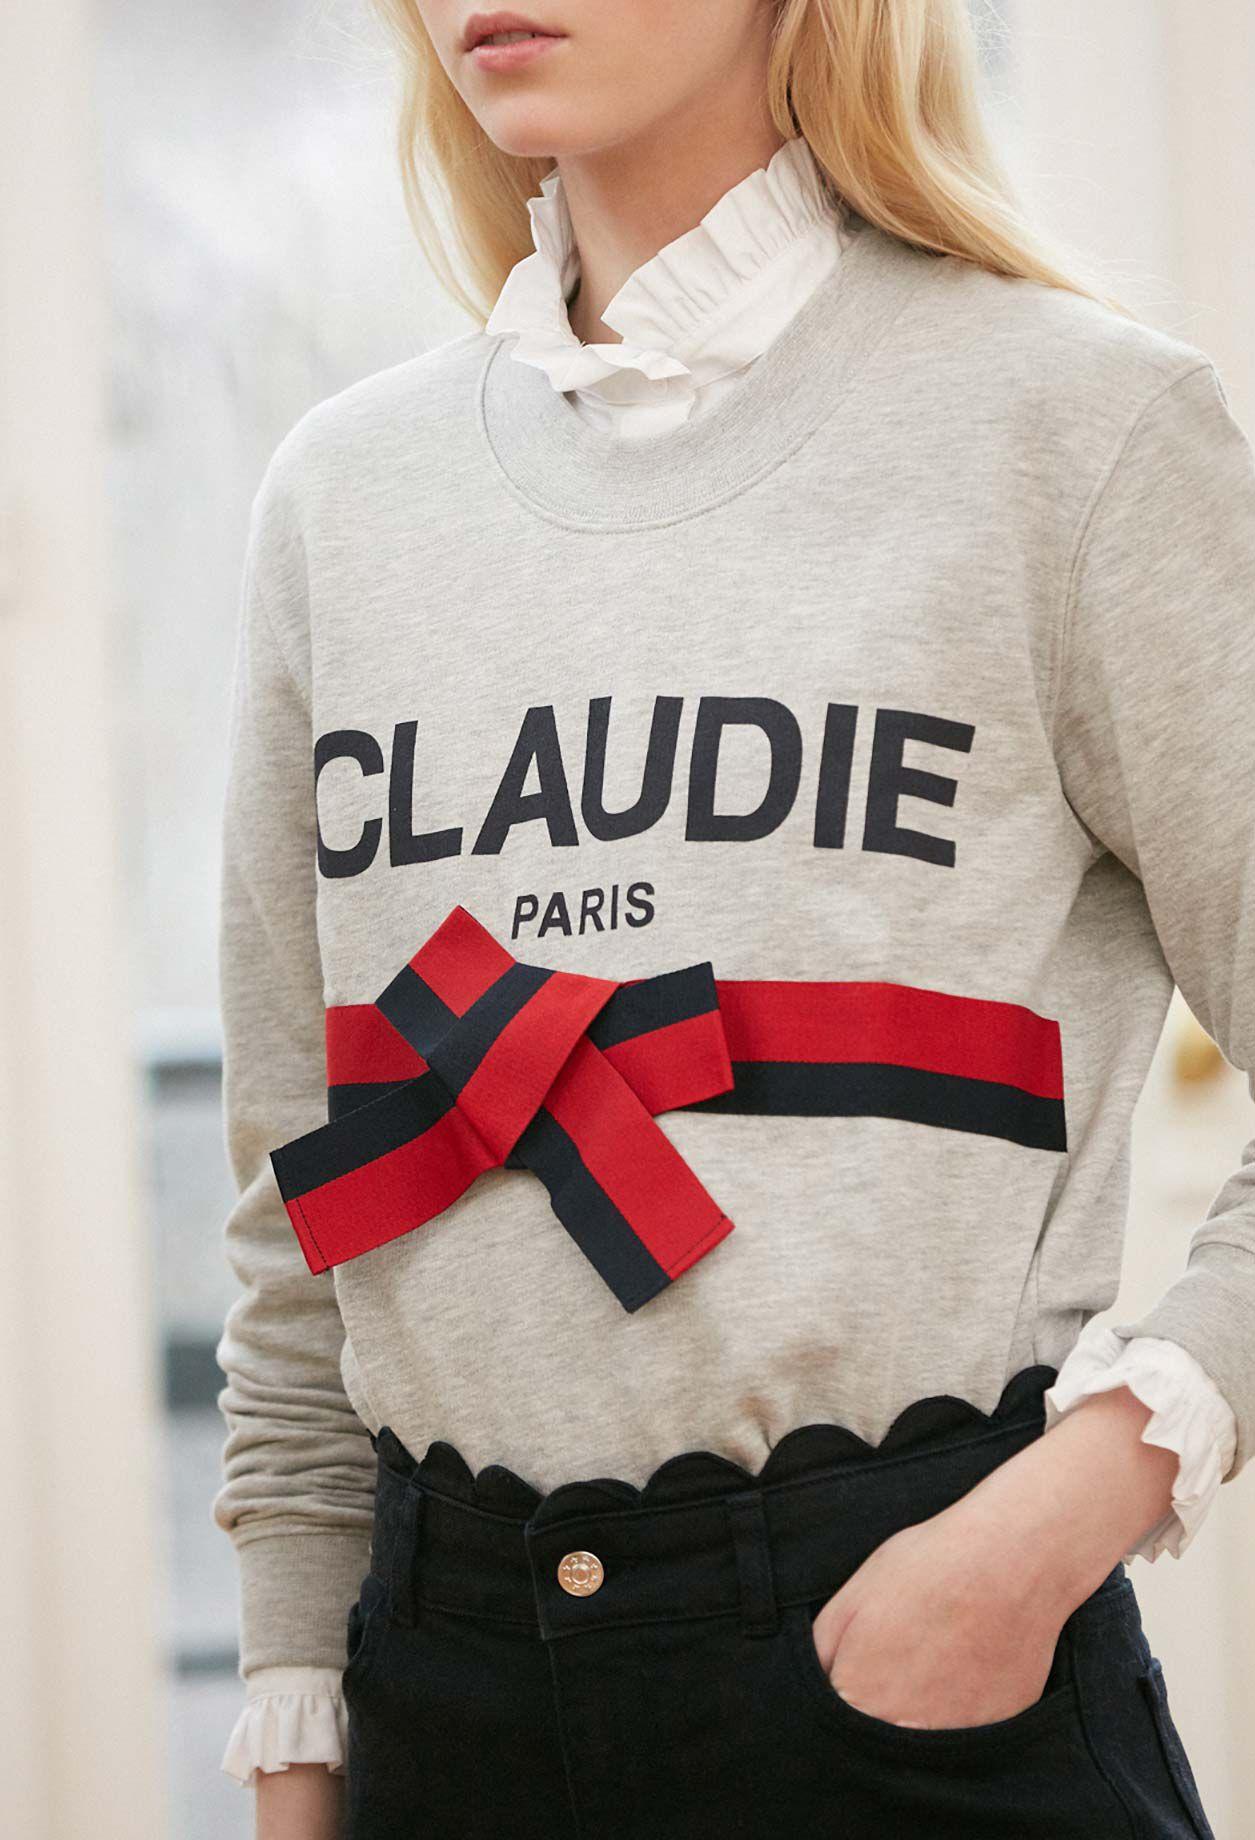 TRADI SWEATER in size T2 | Claudie Pierlot